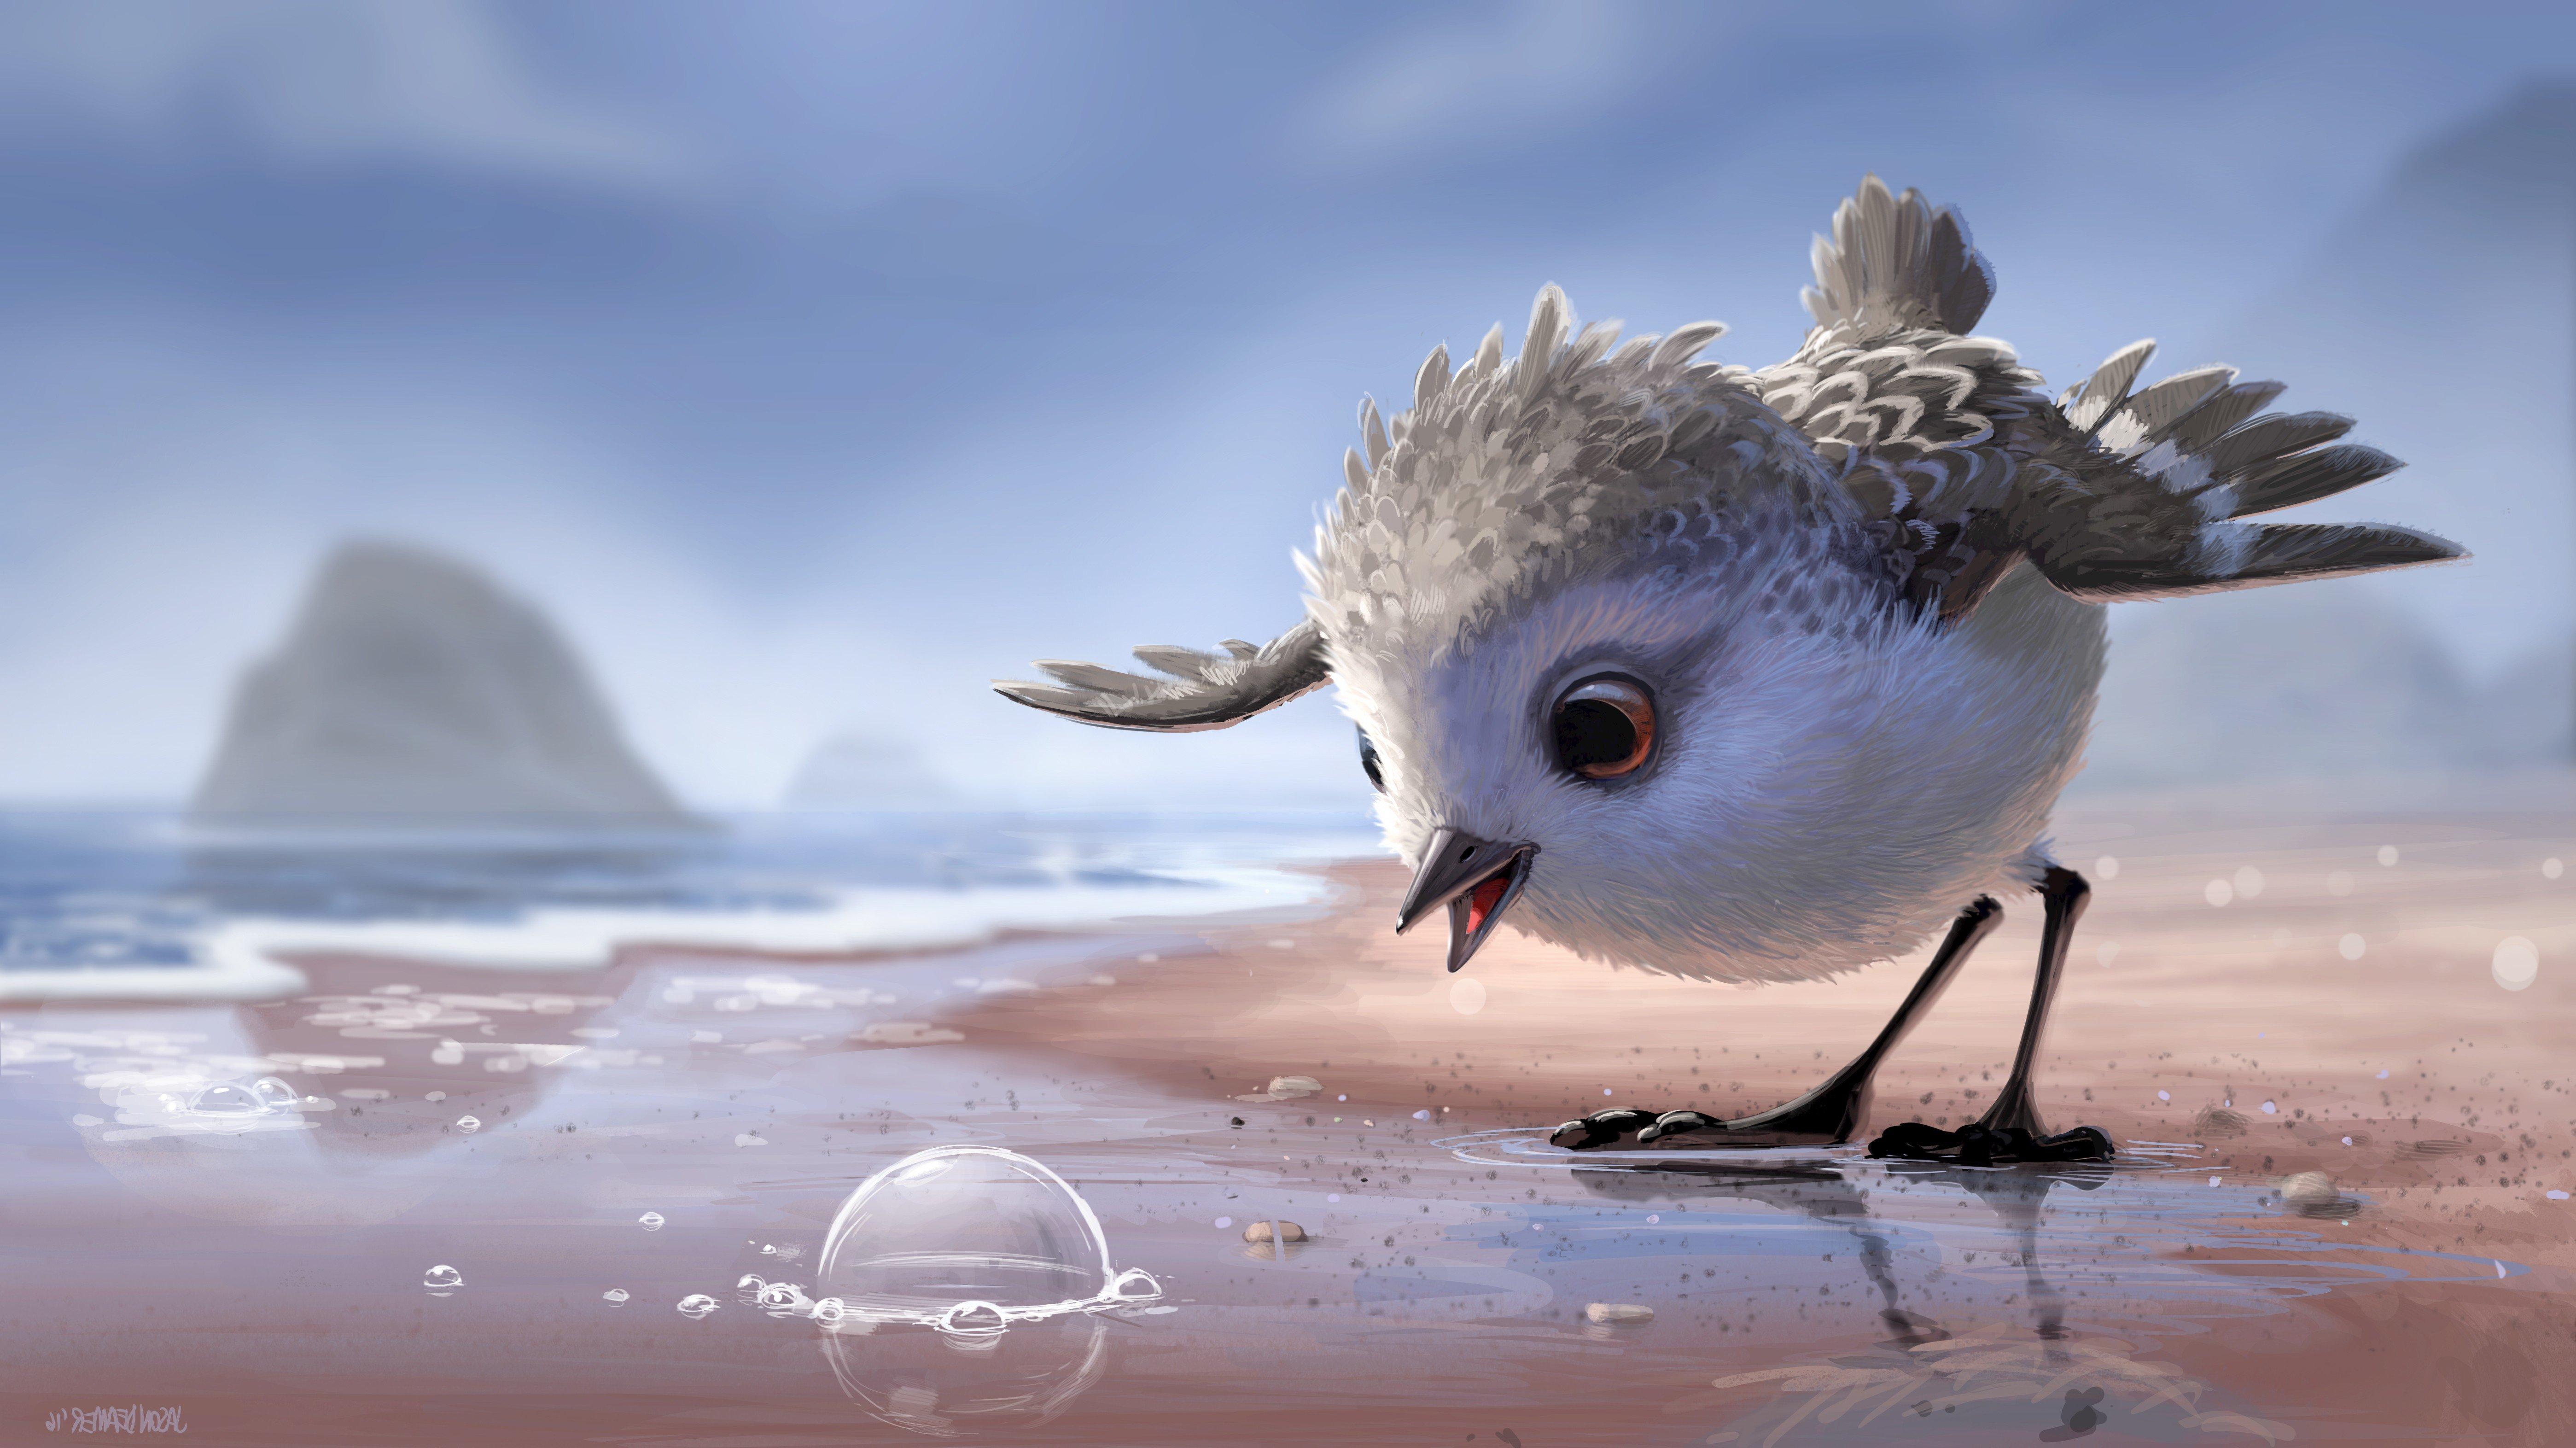 1280x1024 piper pixar animated movie 1280x1024 resolution hd 4k